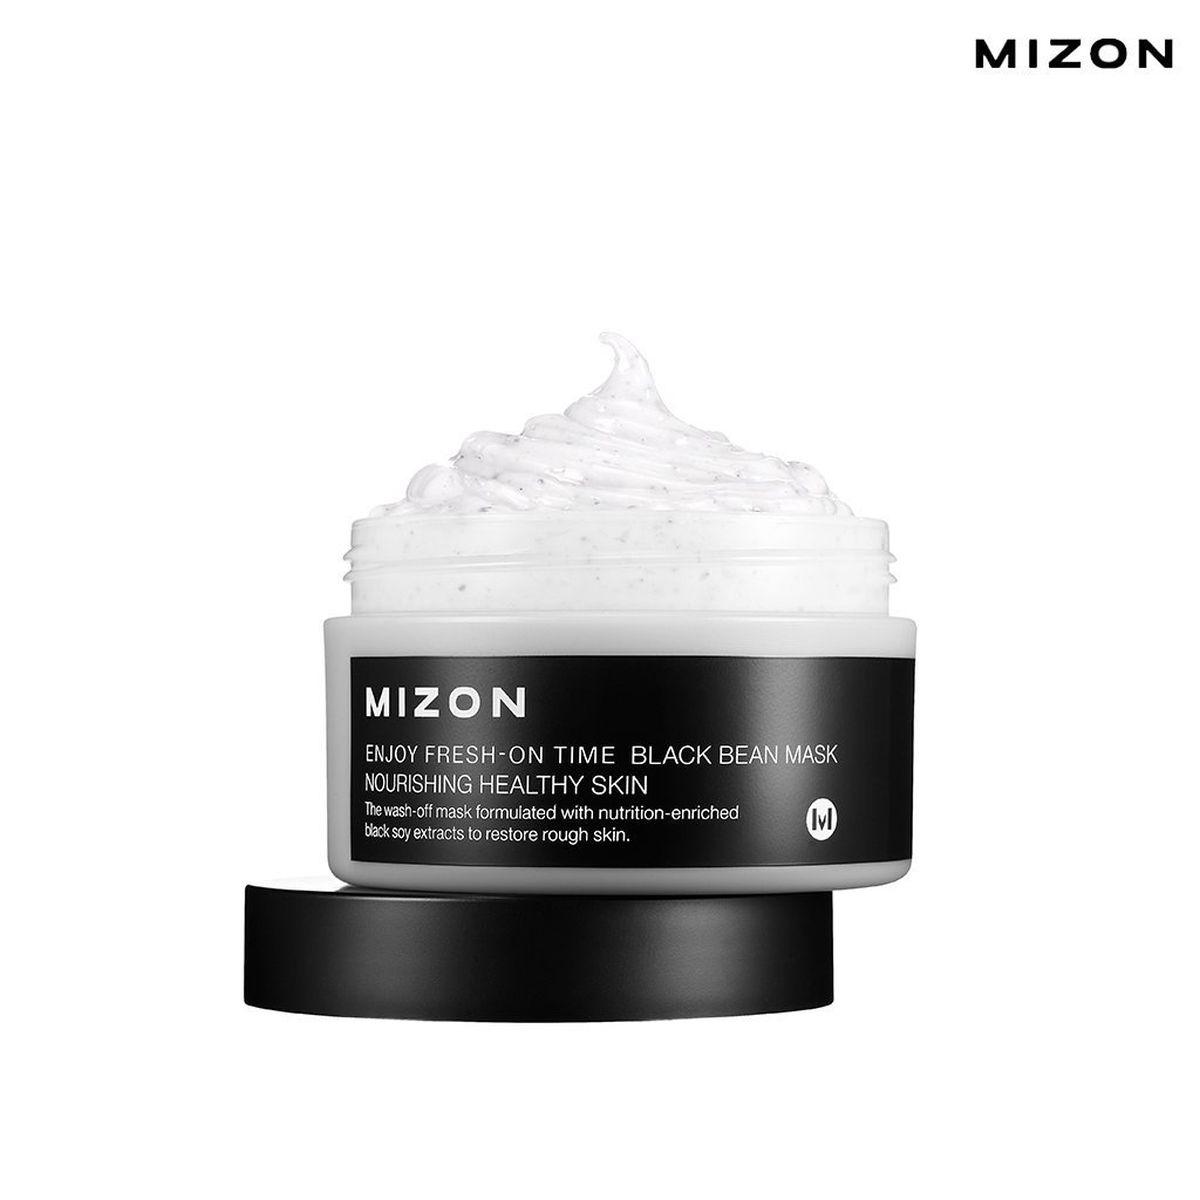 Маска для лица с бобами MIZON Enjoy Fresh-On Time Black Bean Mask - 100 мл